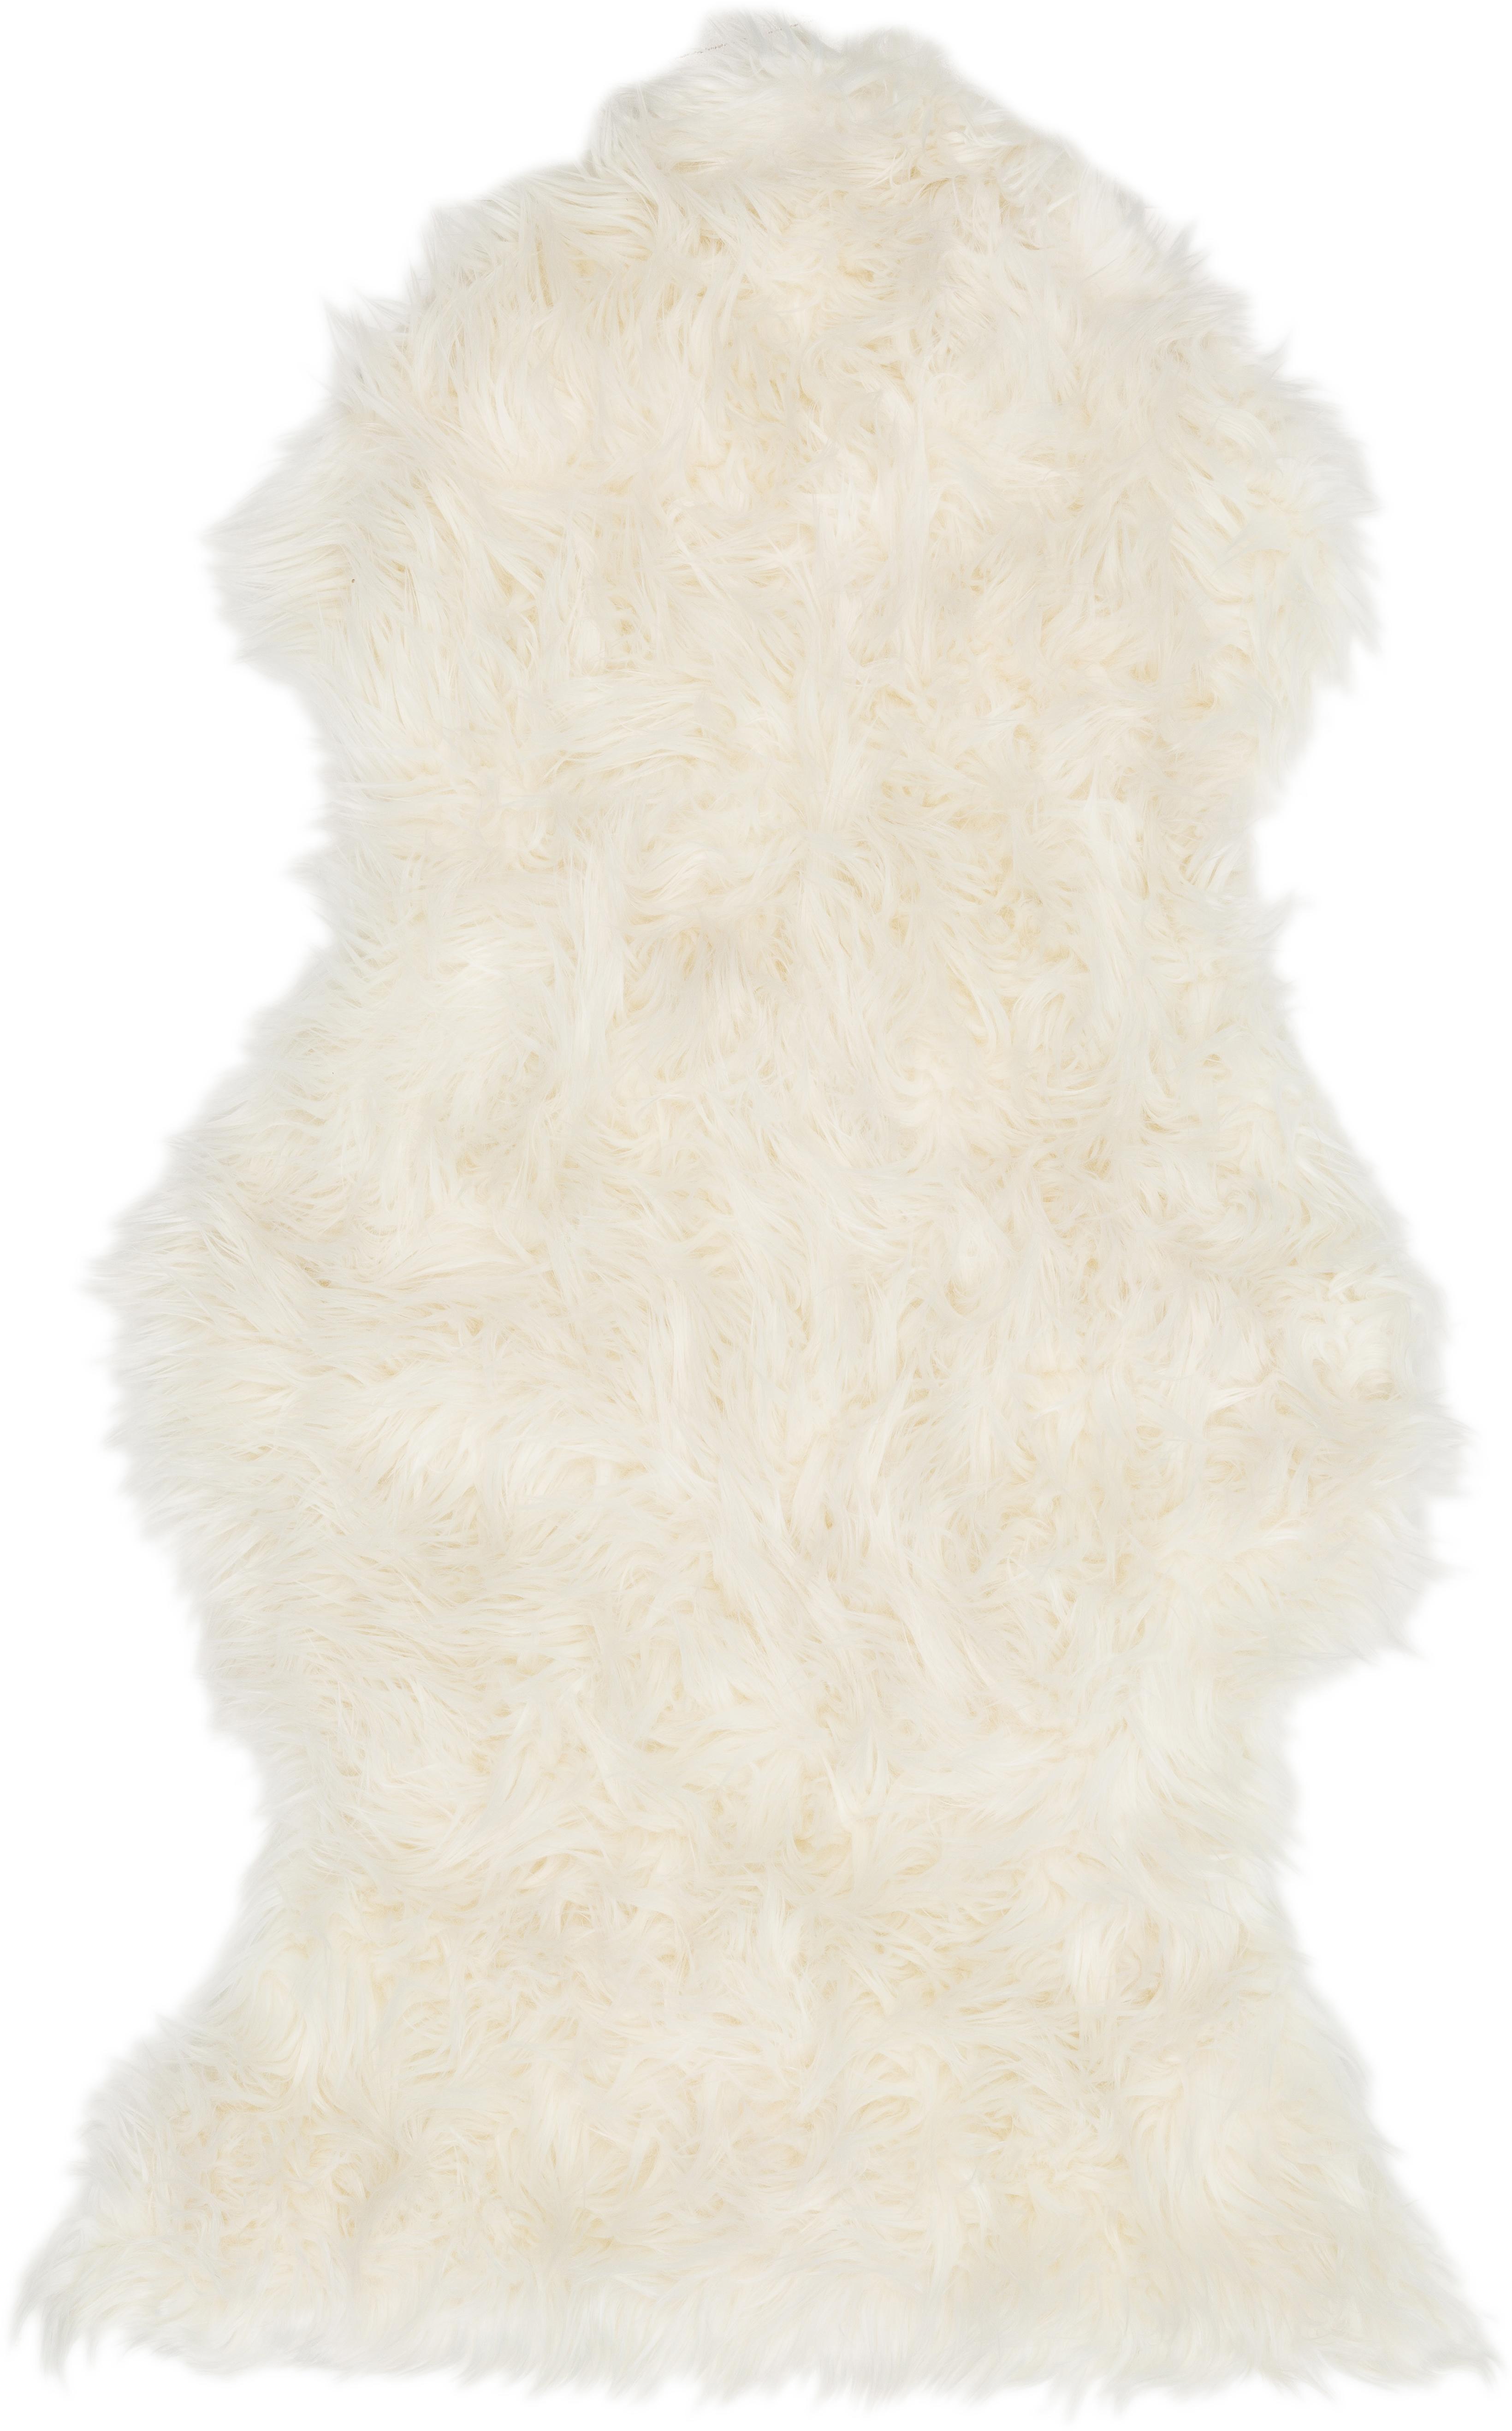 Kunstfell Vancouver, glatt, Vorderseite: 80%Acryl, 20%Polyester, Rückseite: Polyester, glatt, Weiß, 60 x 100 cm